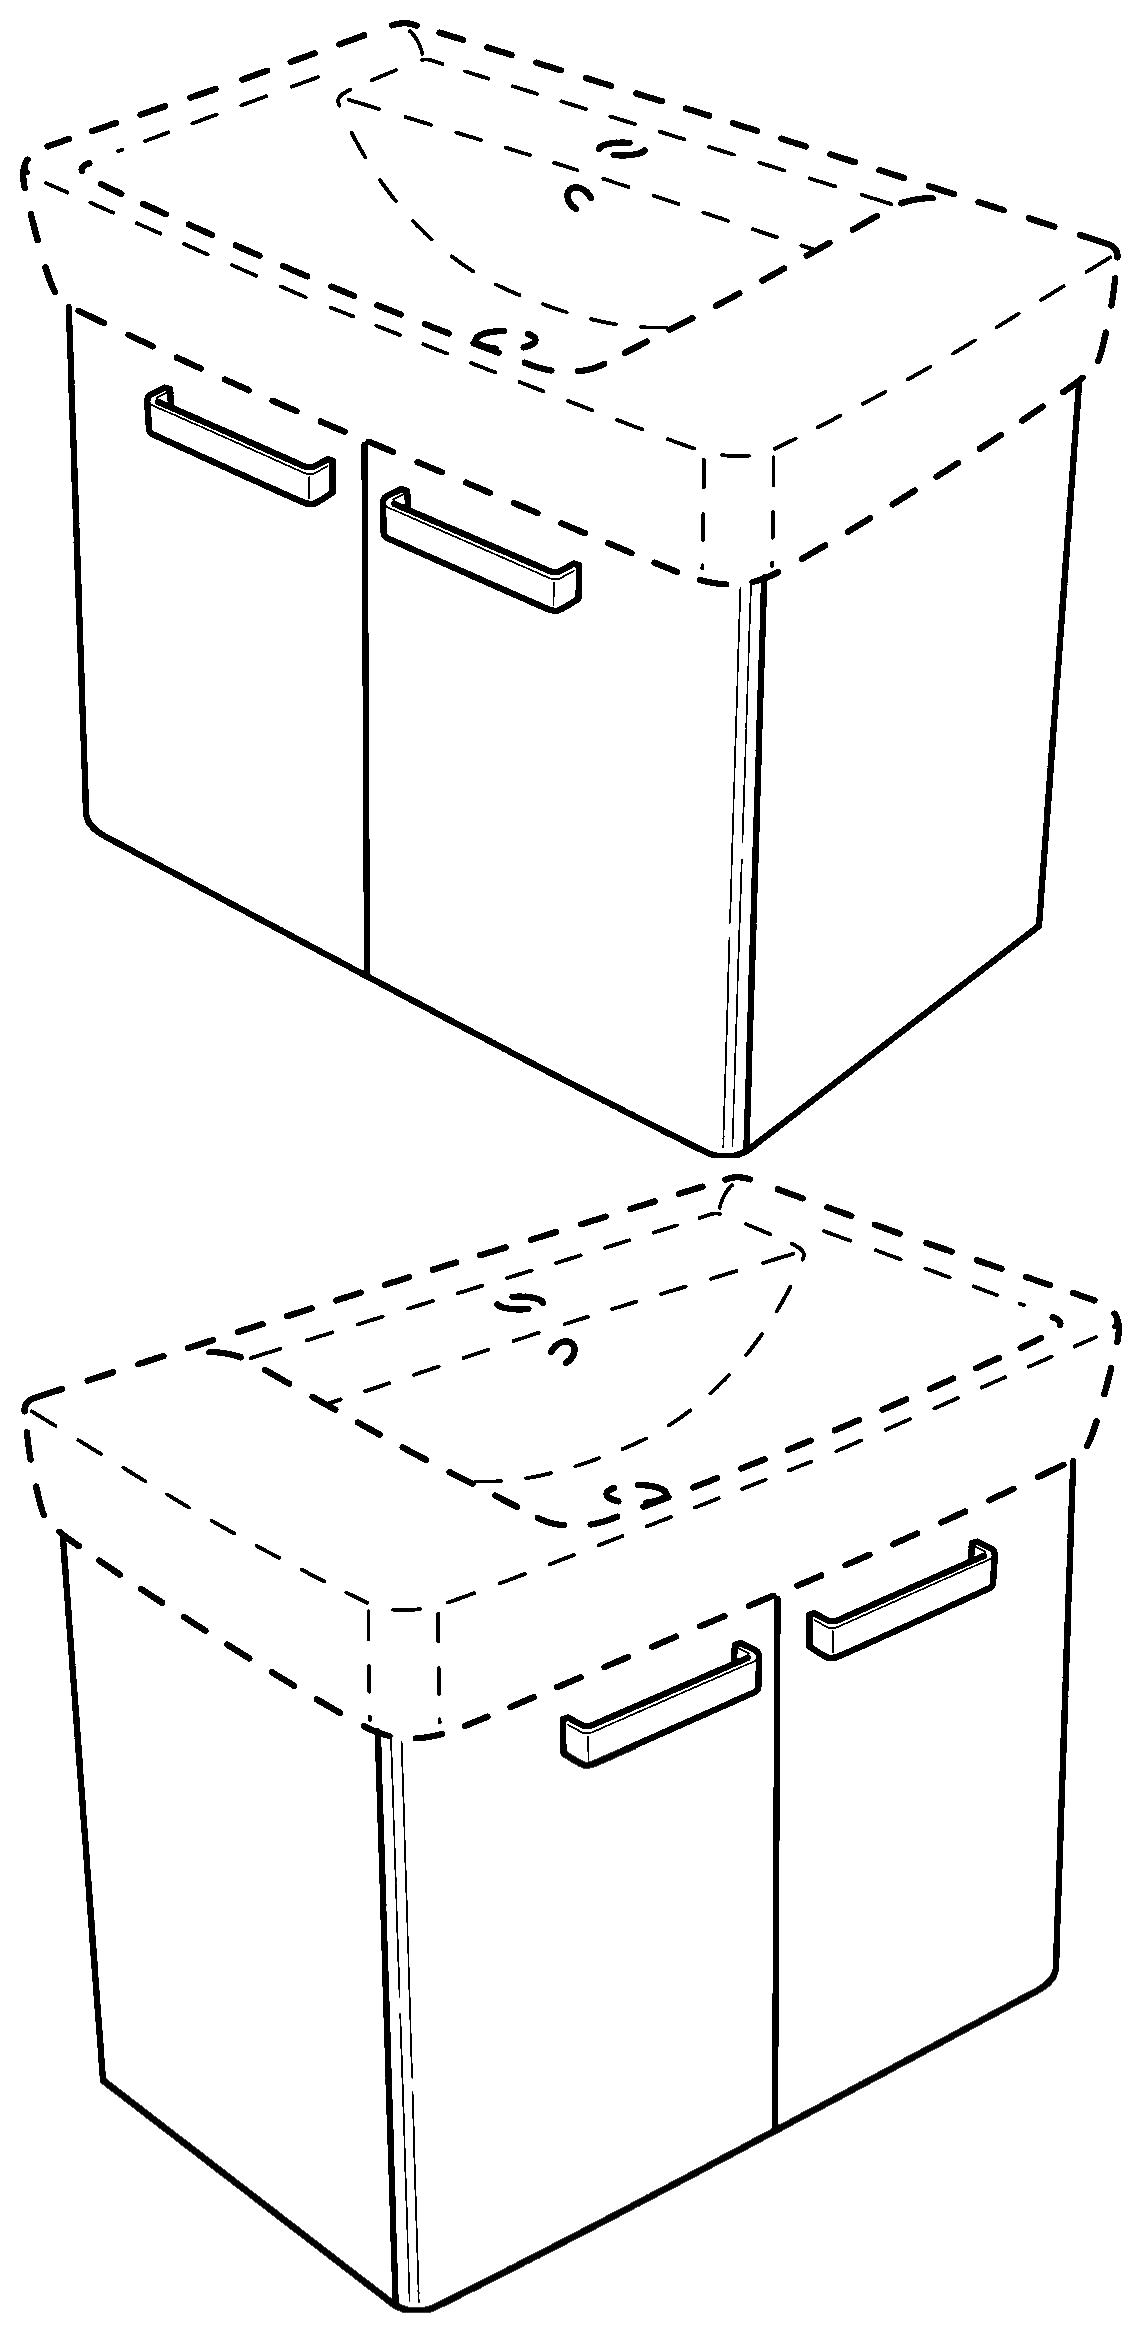 keramag renova nr 1 plan waschtischunterschrank 879140. Black Bedroom Furniture Sets. Home Design Ideas